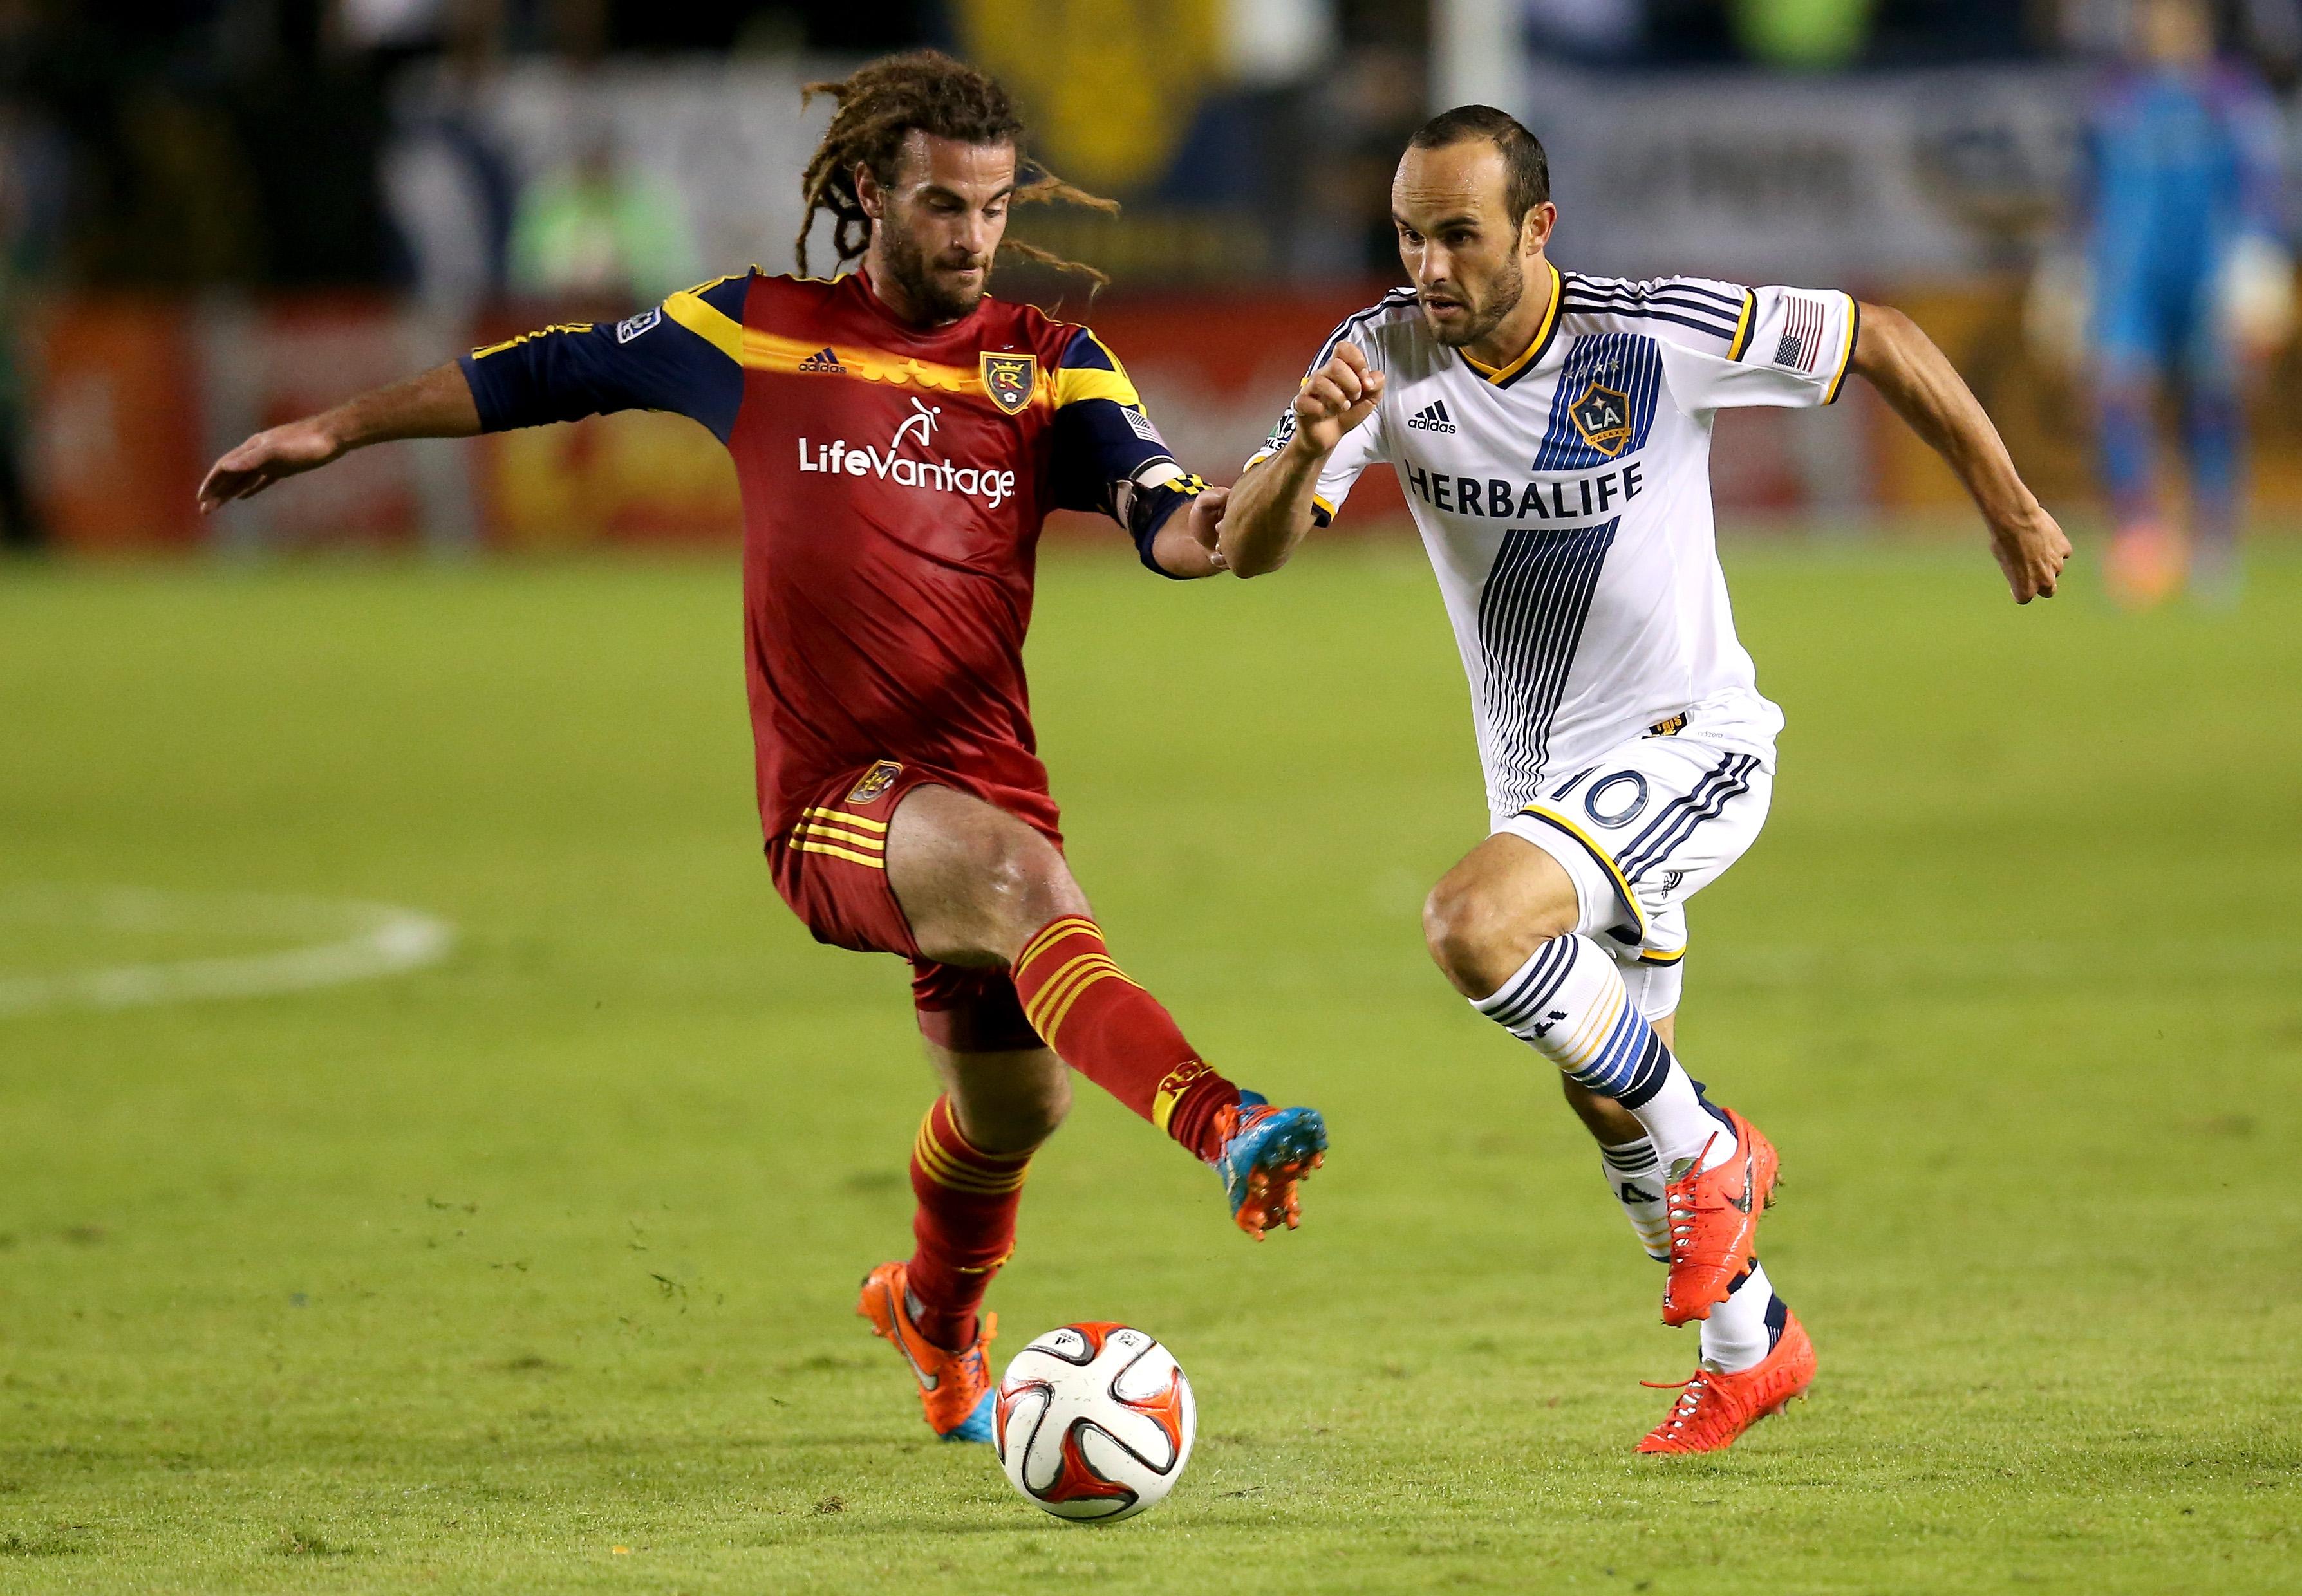 Real Salt Lake v Los Angeles Galaxy - Western Conference Semifinals - Leg 2